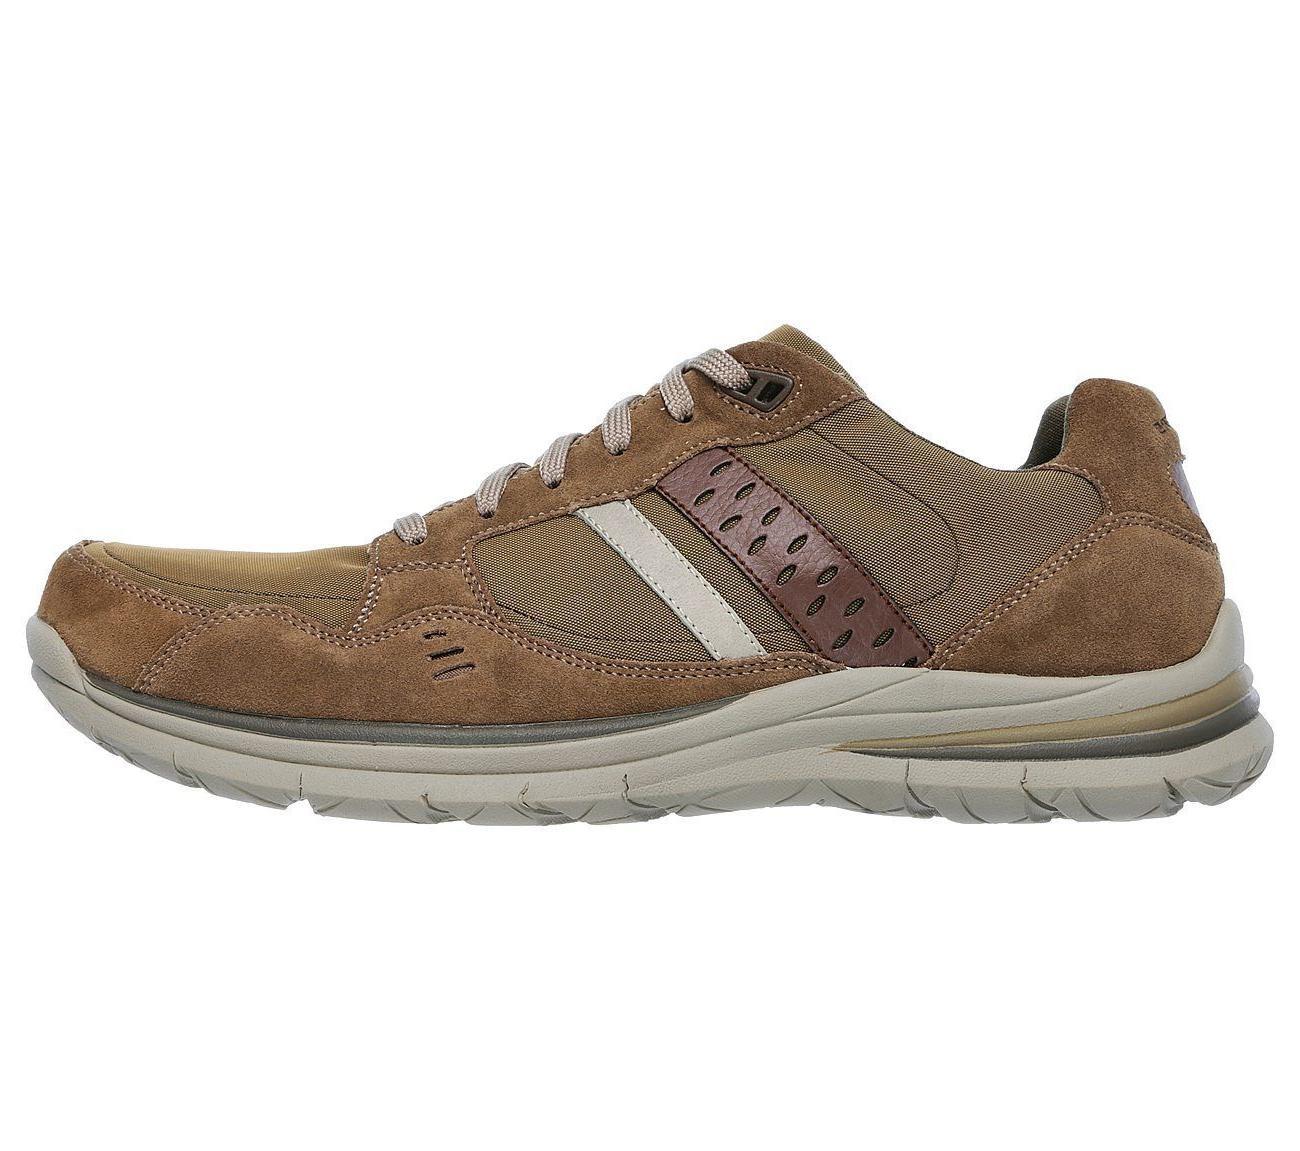 65203 Brown Skechers Men Casual